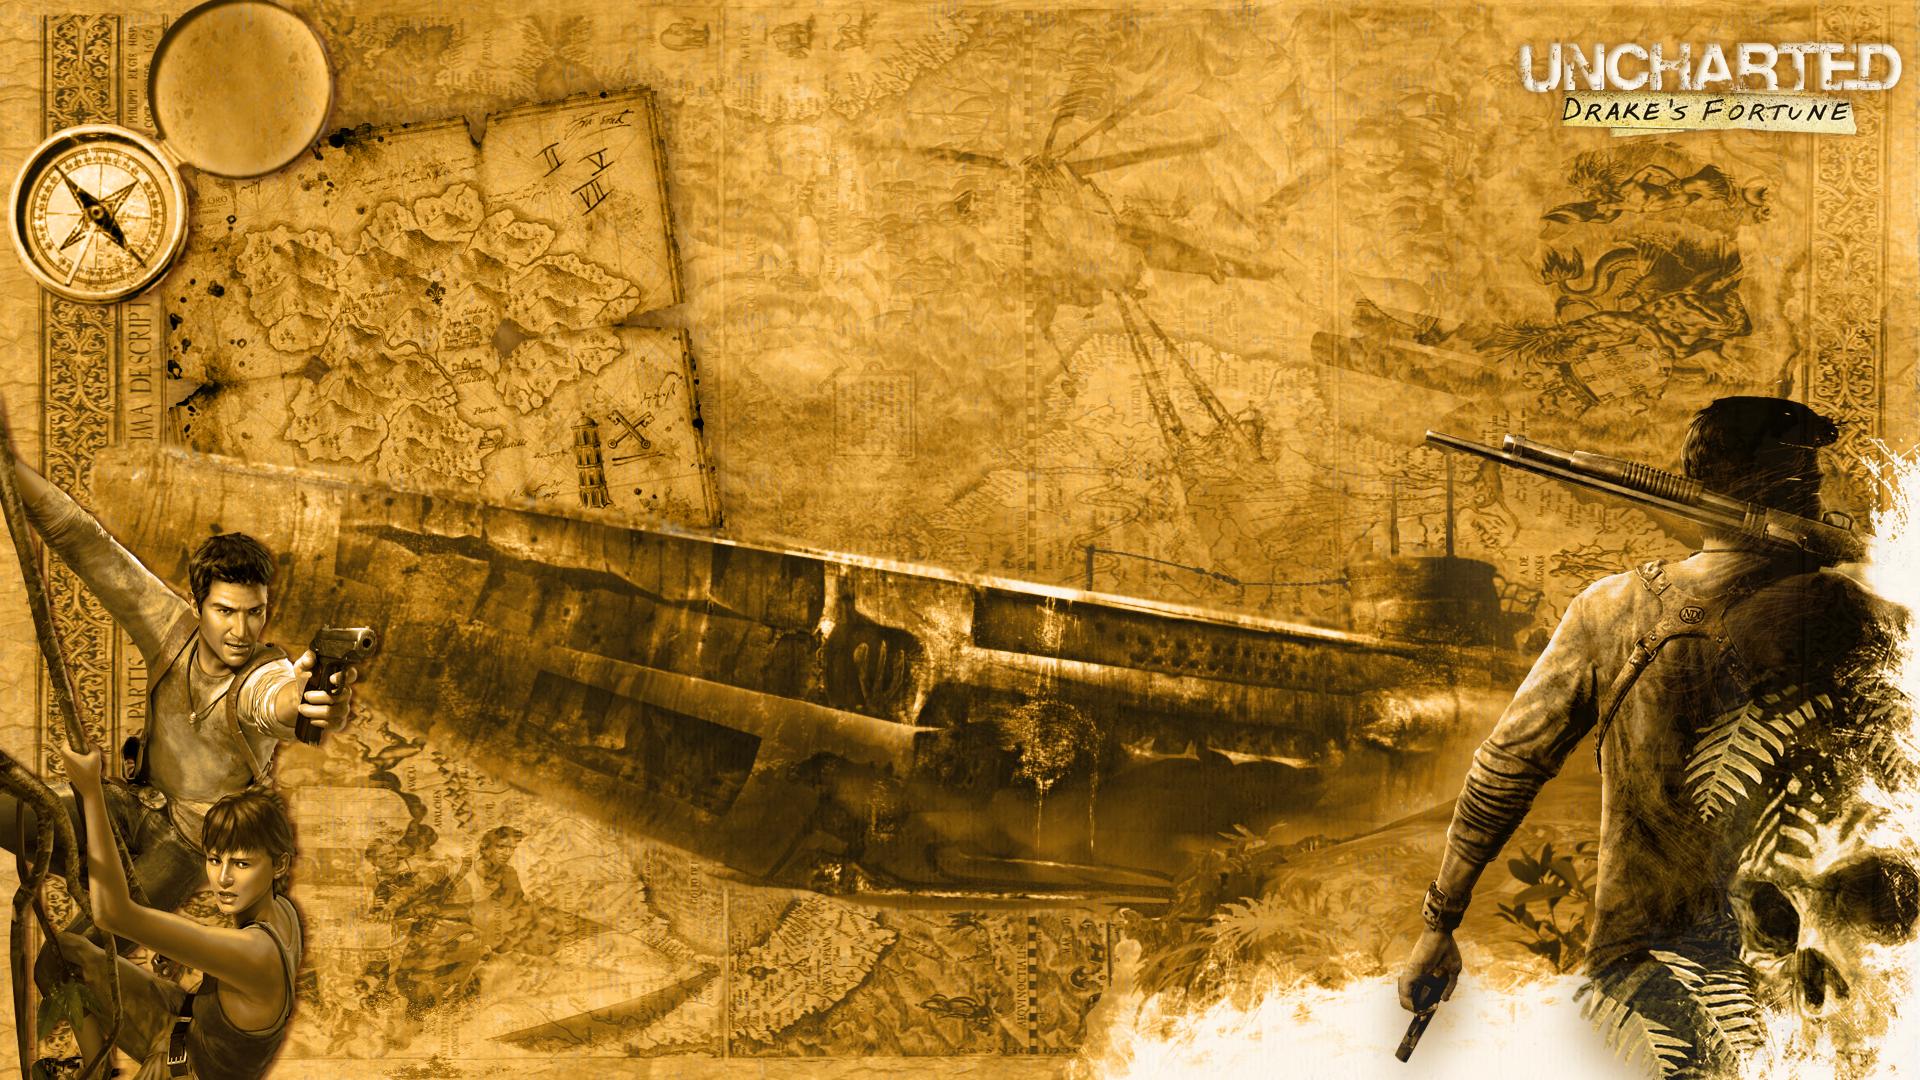 Uncharted wallpaper 1920x1080